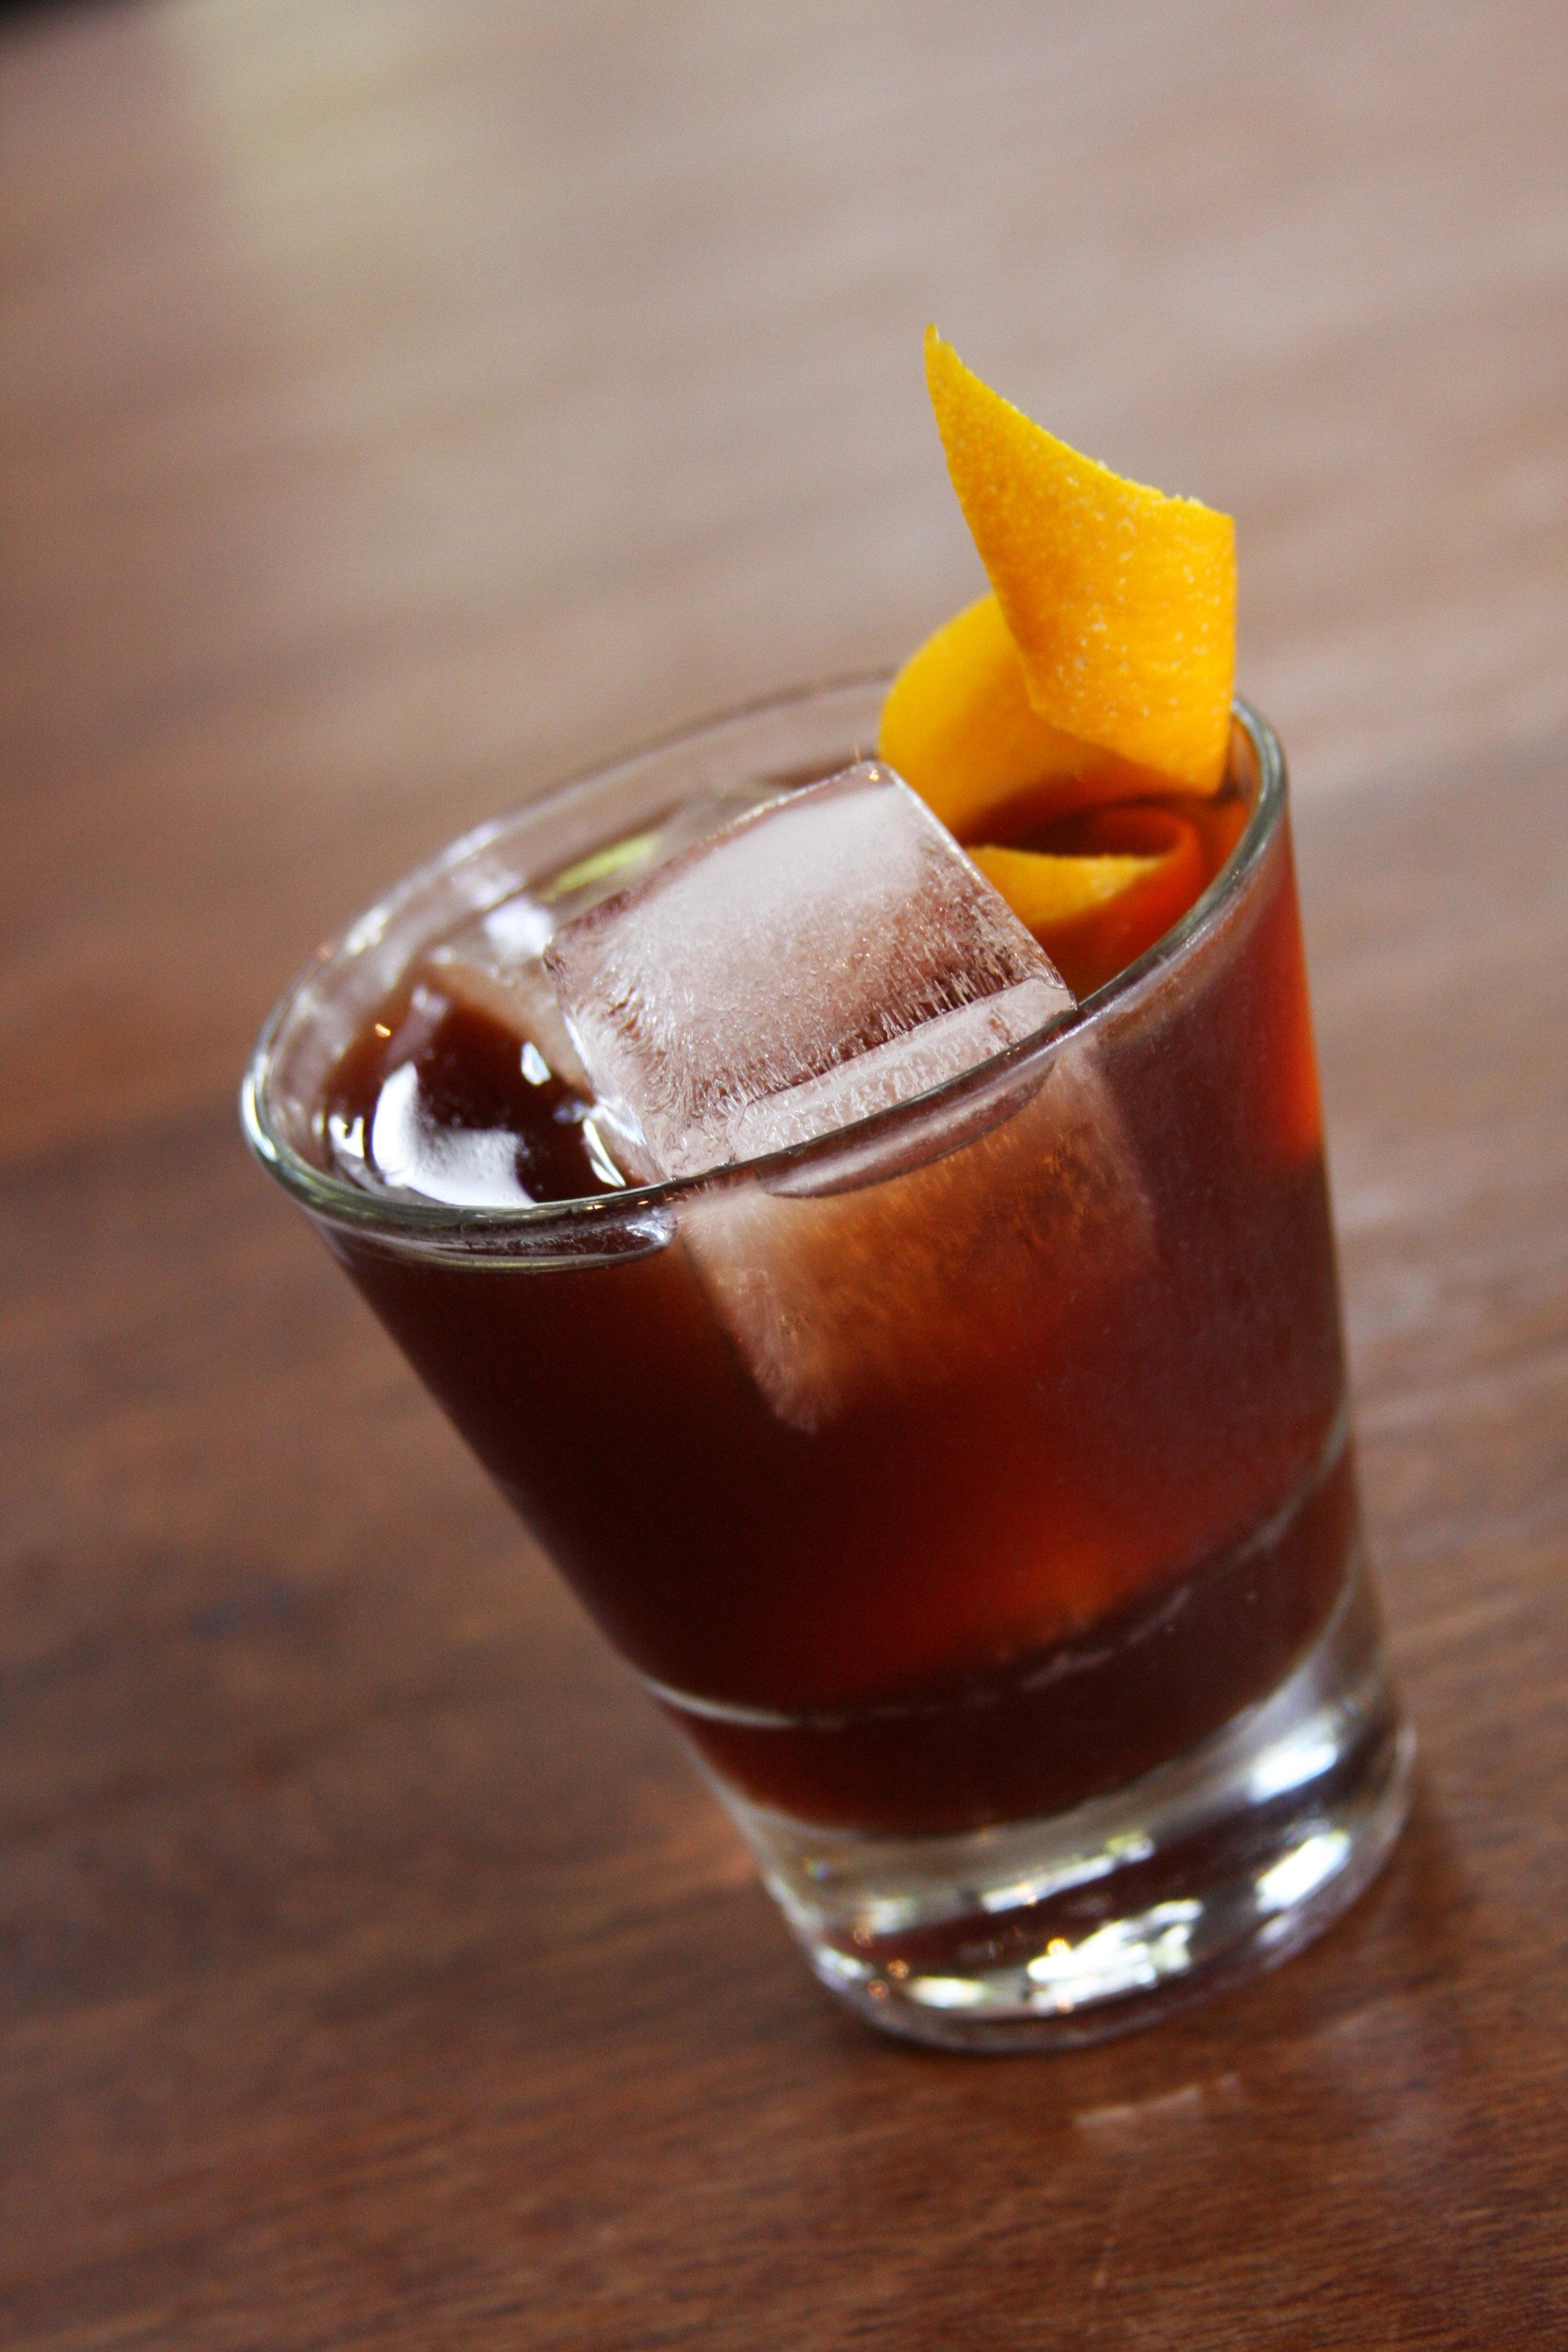 Countess Cristoforetti - Aria Portland dry ginGreen coffee CampariBraulioCocchi Vermouth di TorinoJacobsen Sea Salt salineNathan Gerdes, La MouleMarch 2018